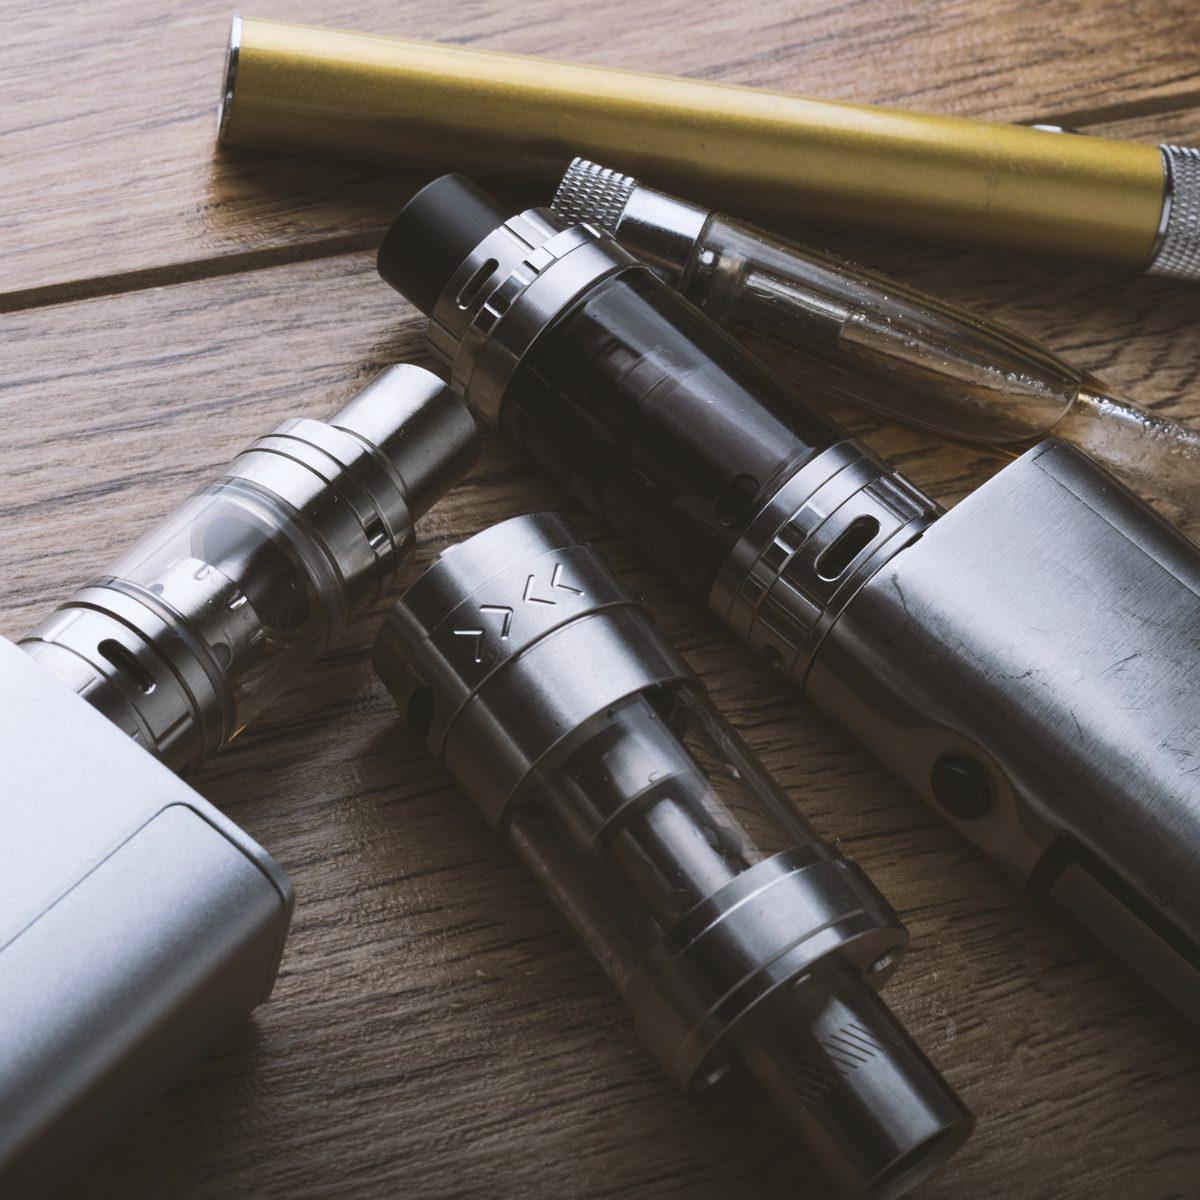 CBD vape juice, vape cartridge. vape, CBD isolate, terpenes, DIY